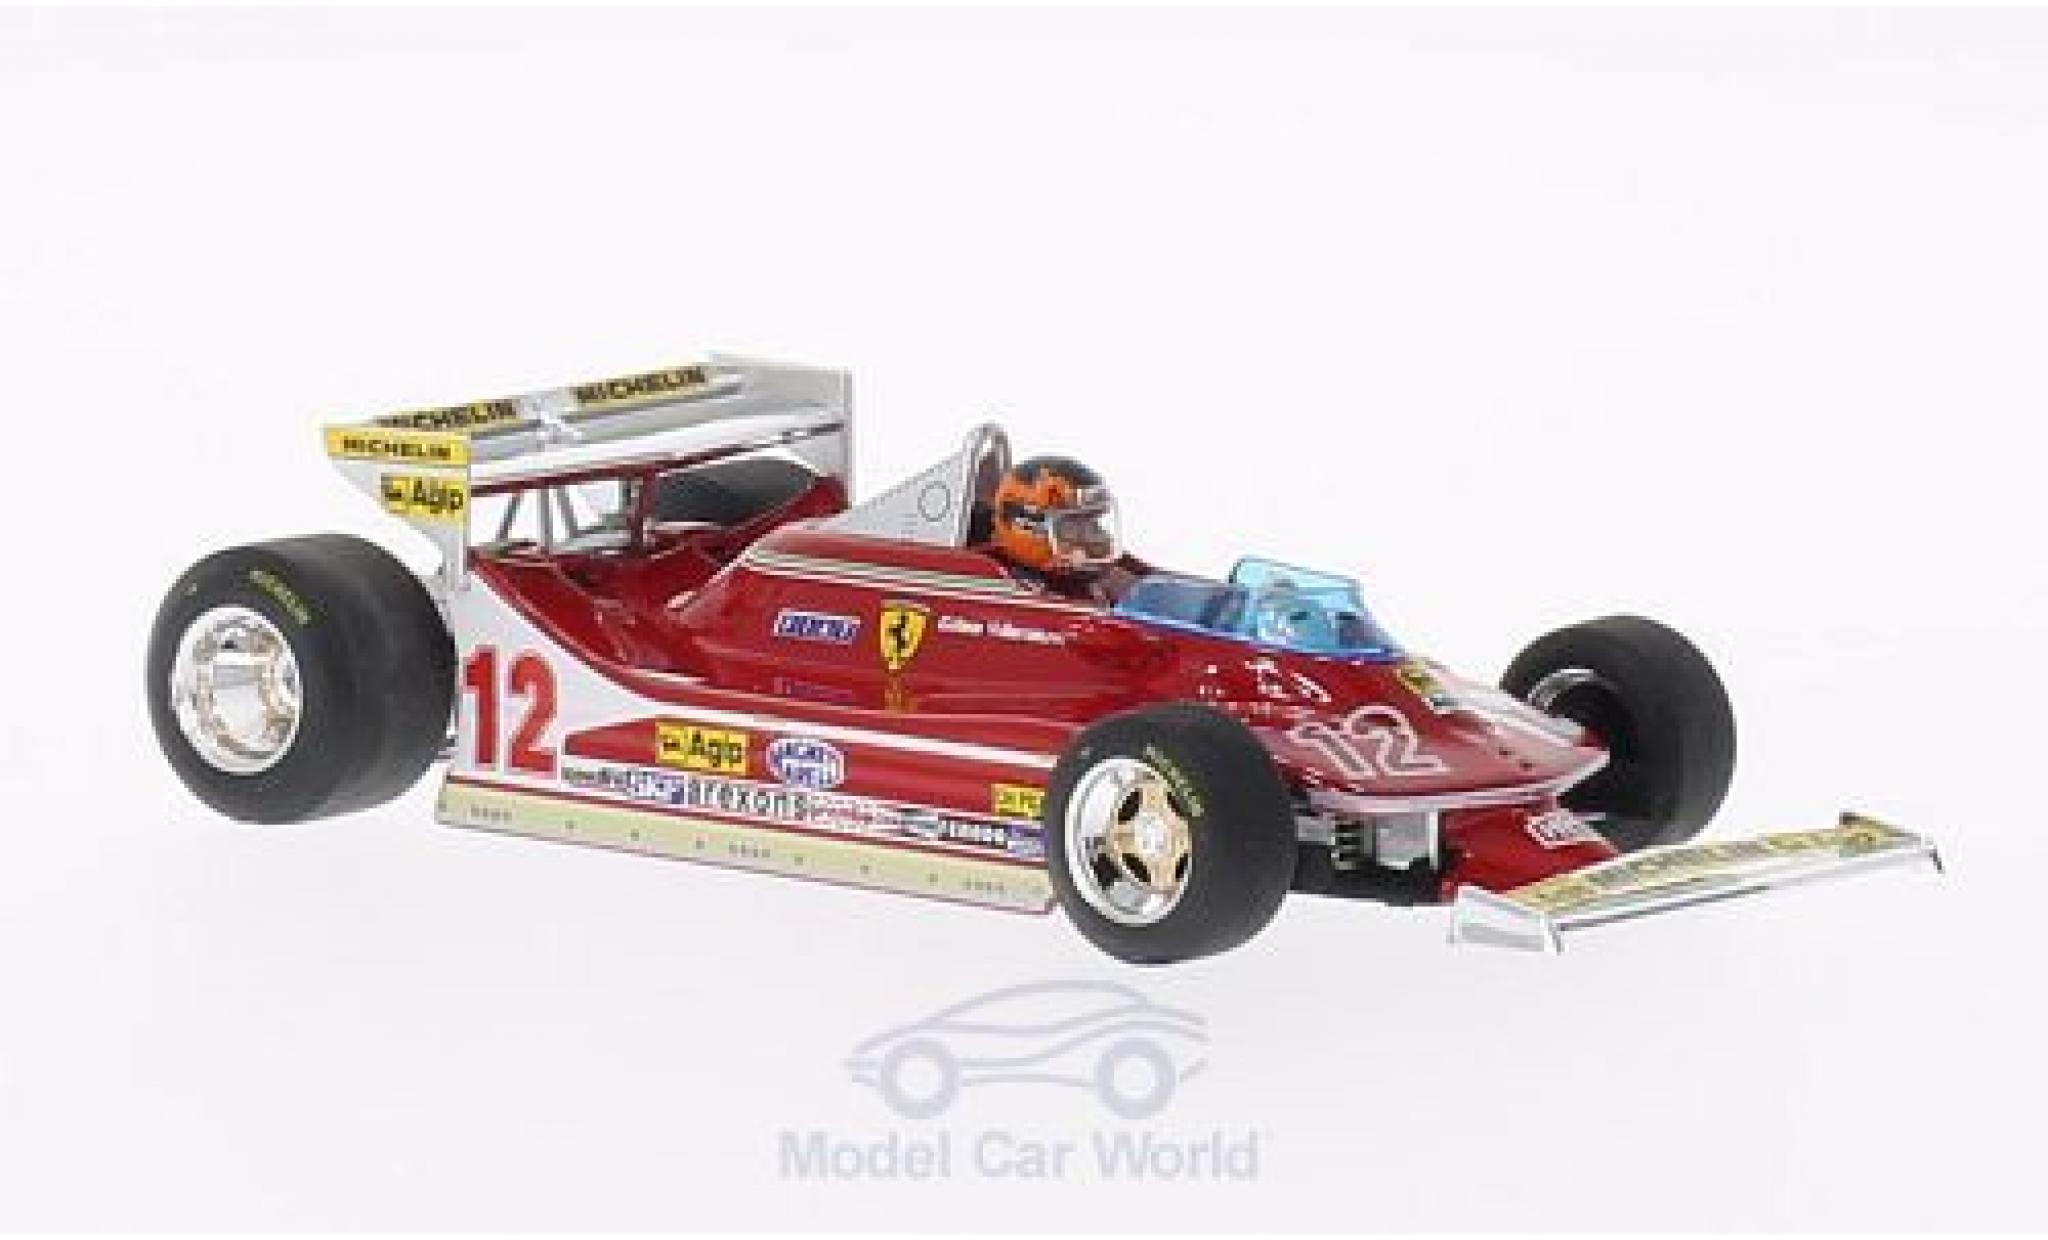 Ferrari 312 T4 1/43 Brumm No.12 GP Monaco 1979 mit Fahrerfigur G.Villeneuve